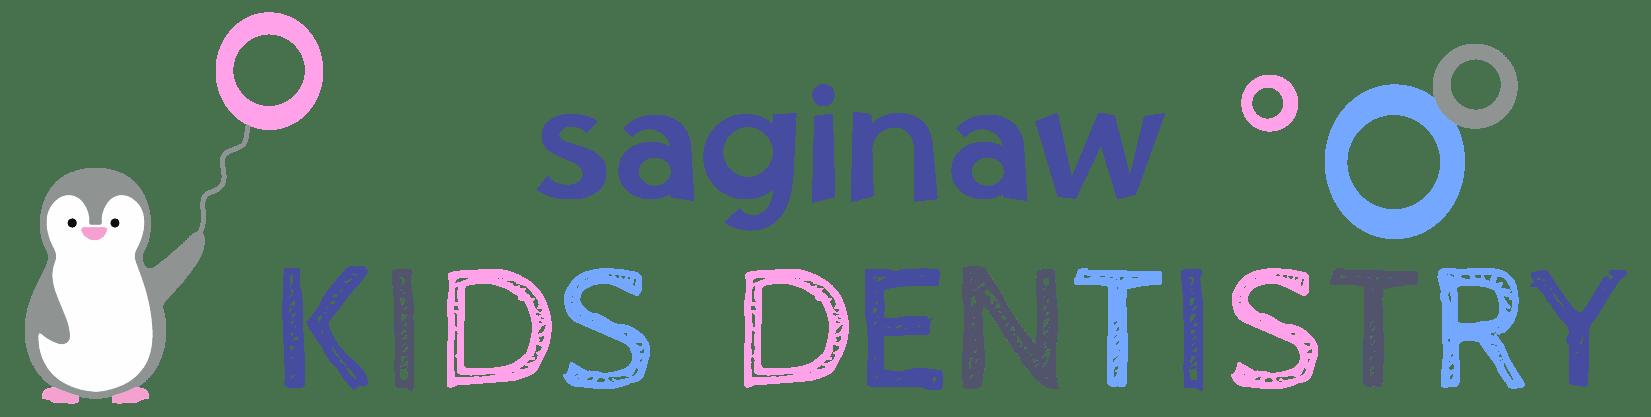 Saginaw Pediatric Dentistry logo